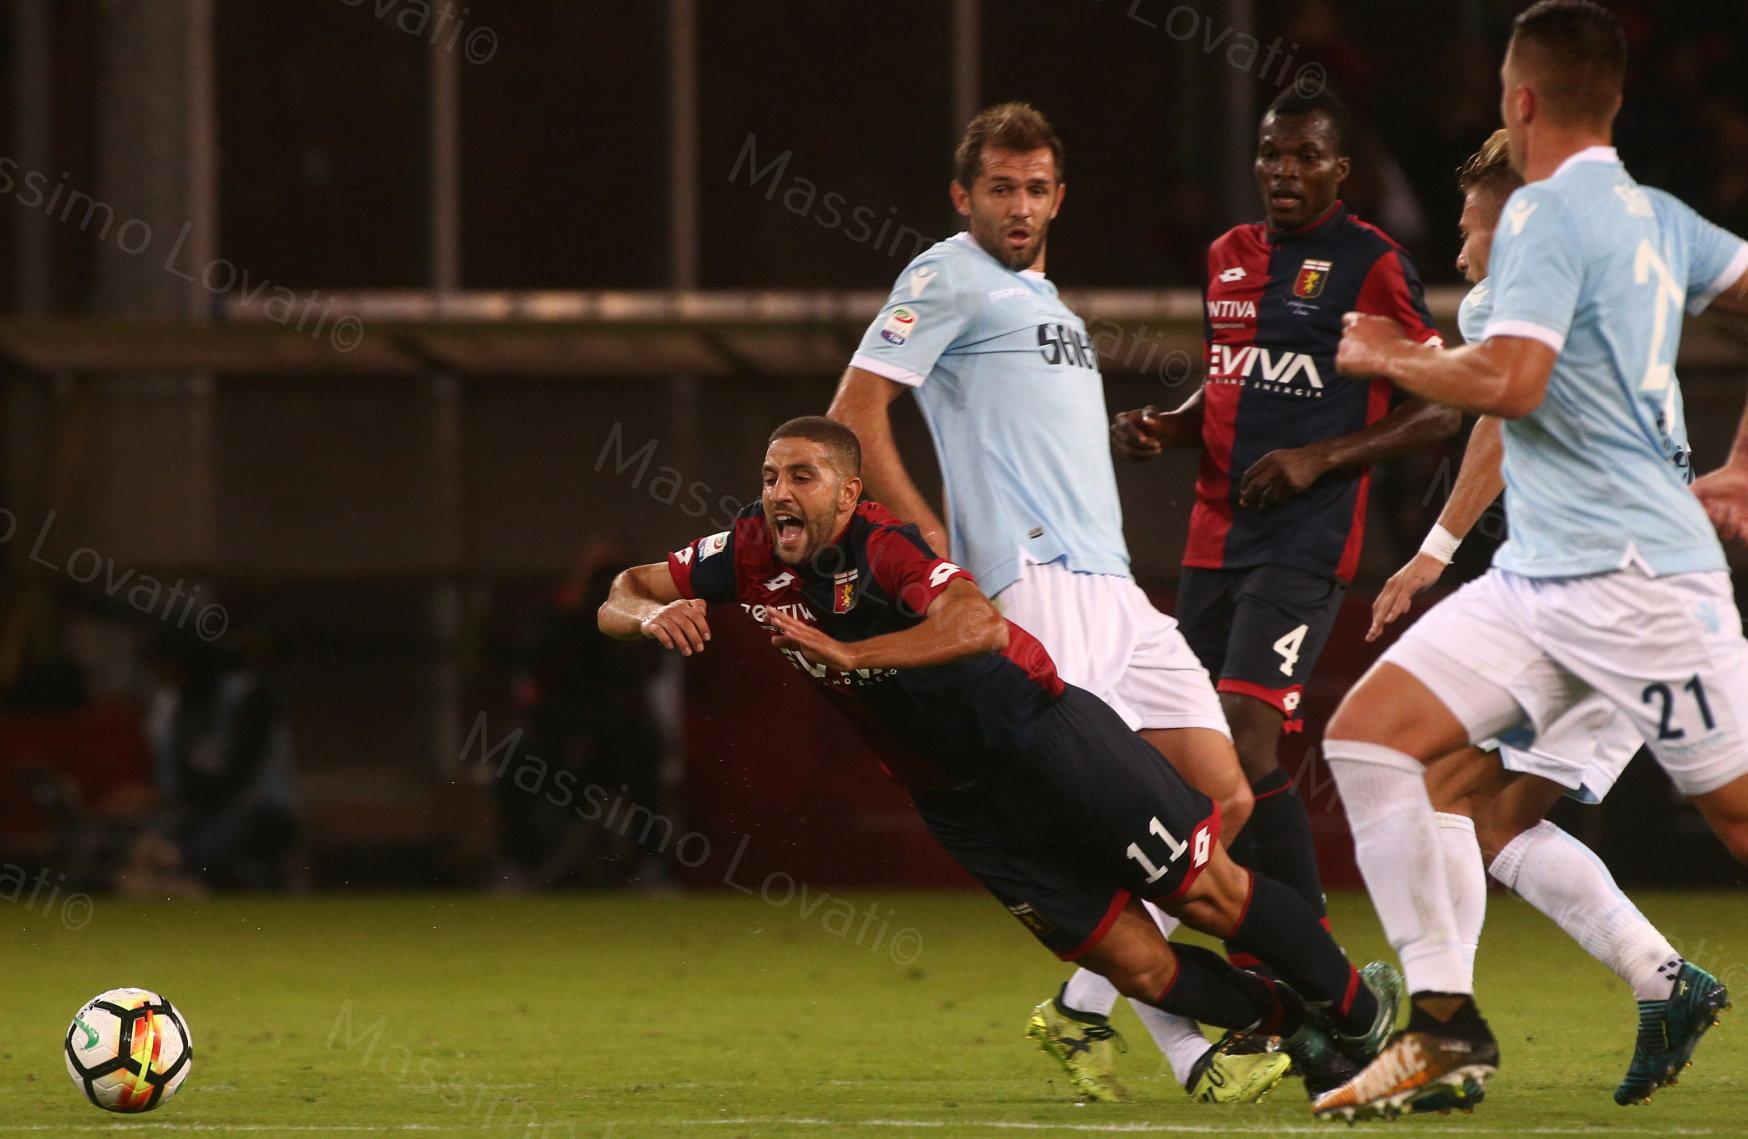 Genoa - Lazio 2017/2018,  Taarabt in caduta... libera... non tanto